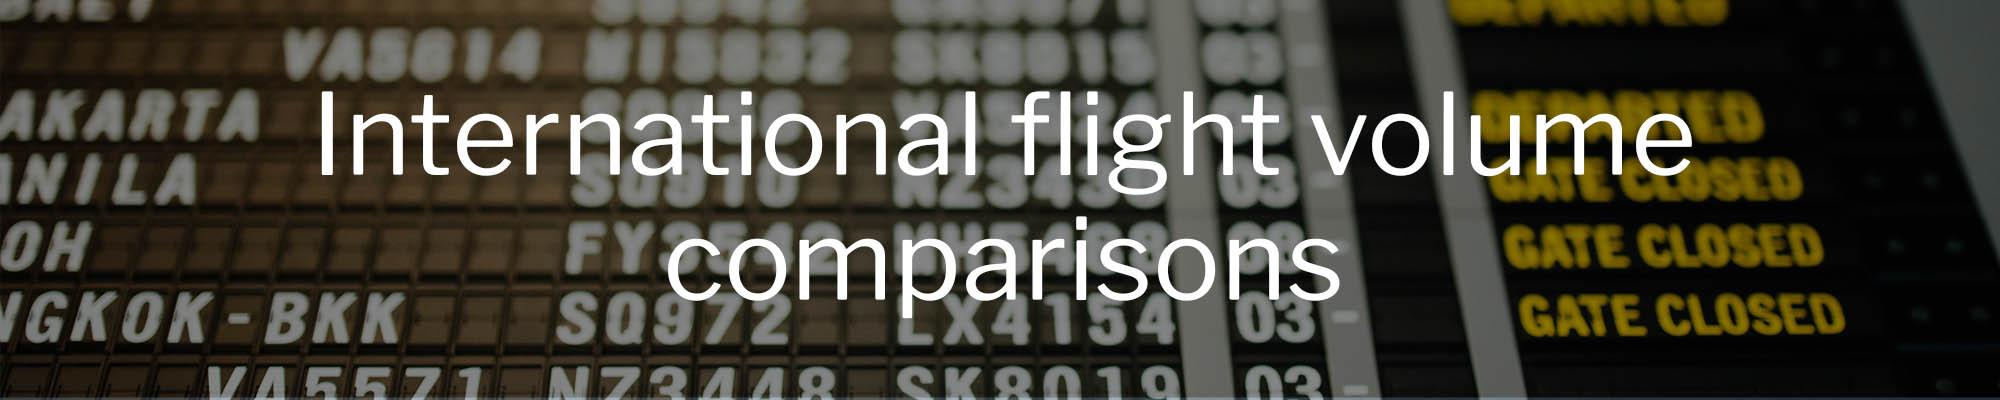 International flight volume metrics 2021